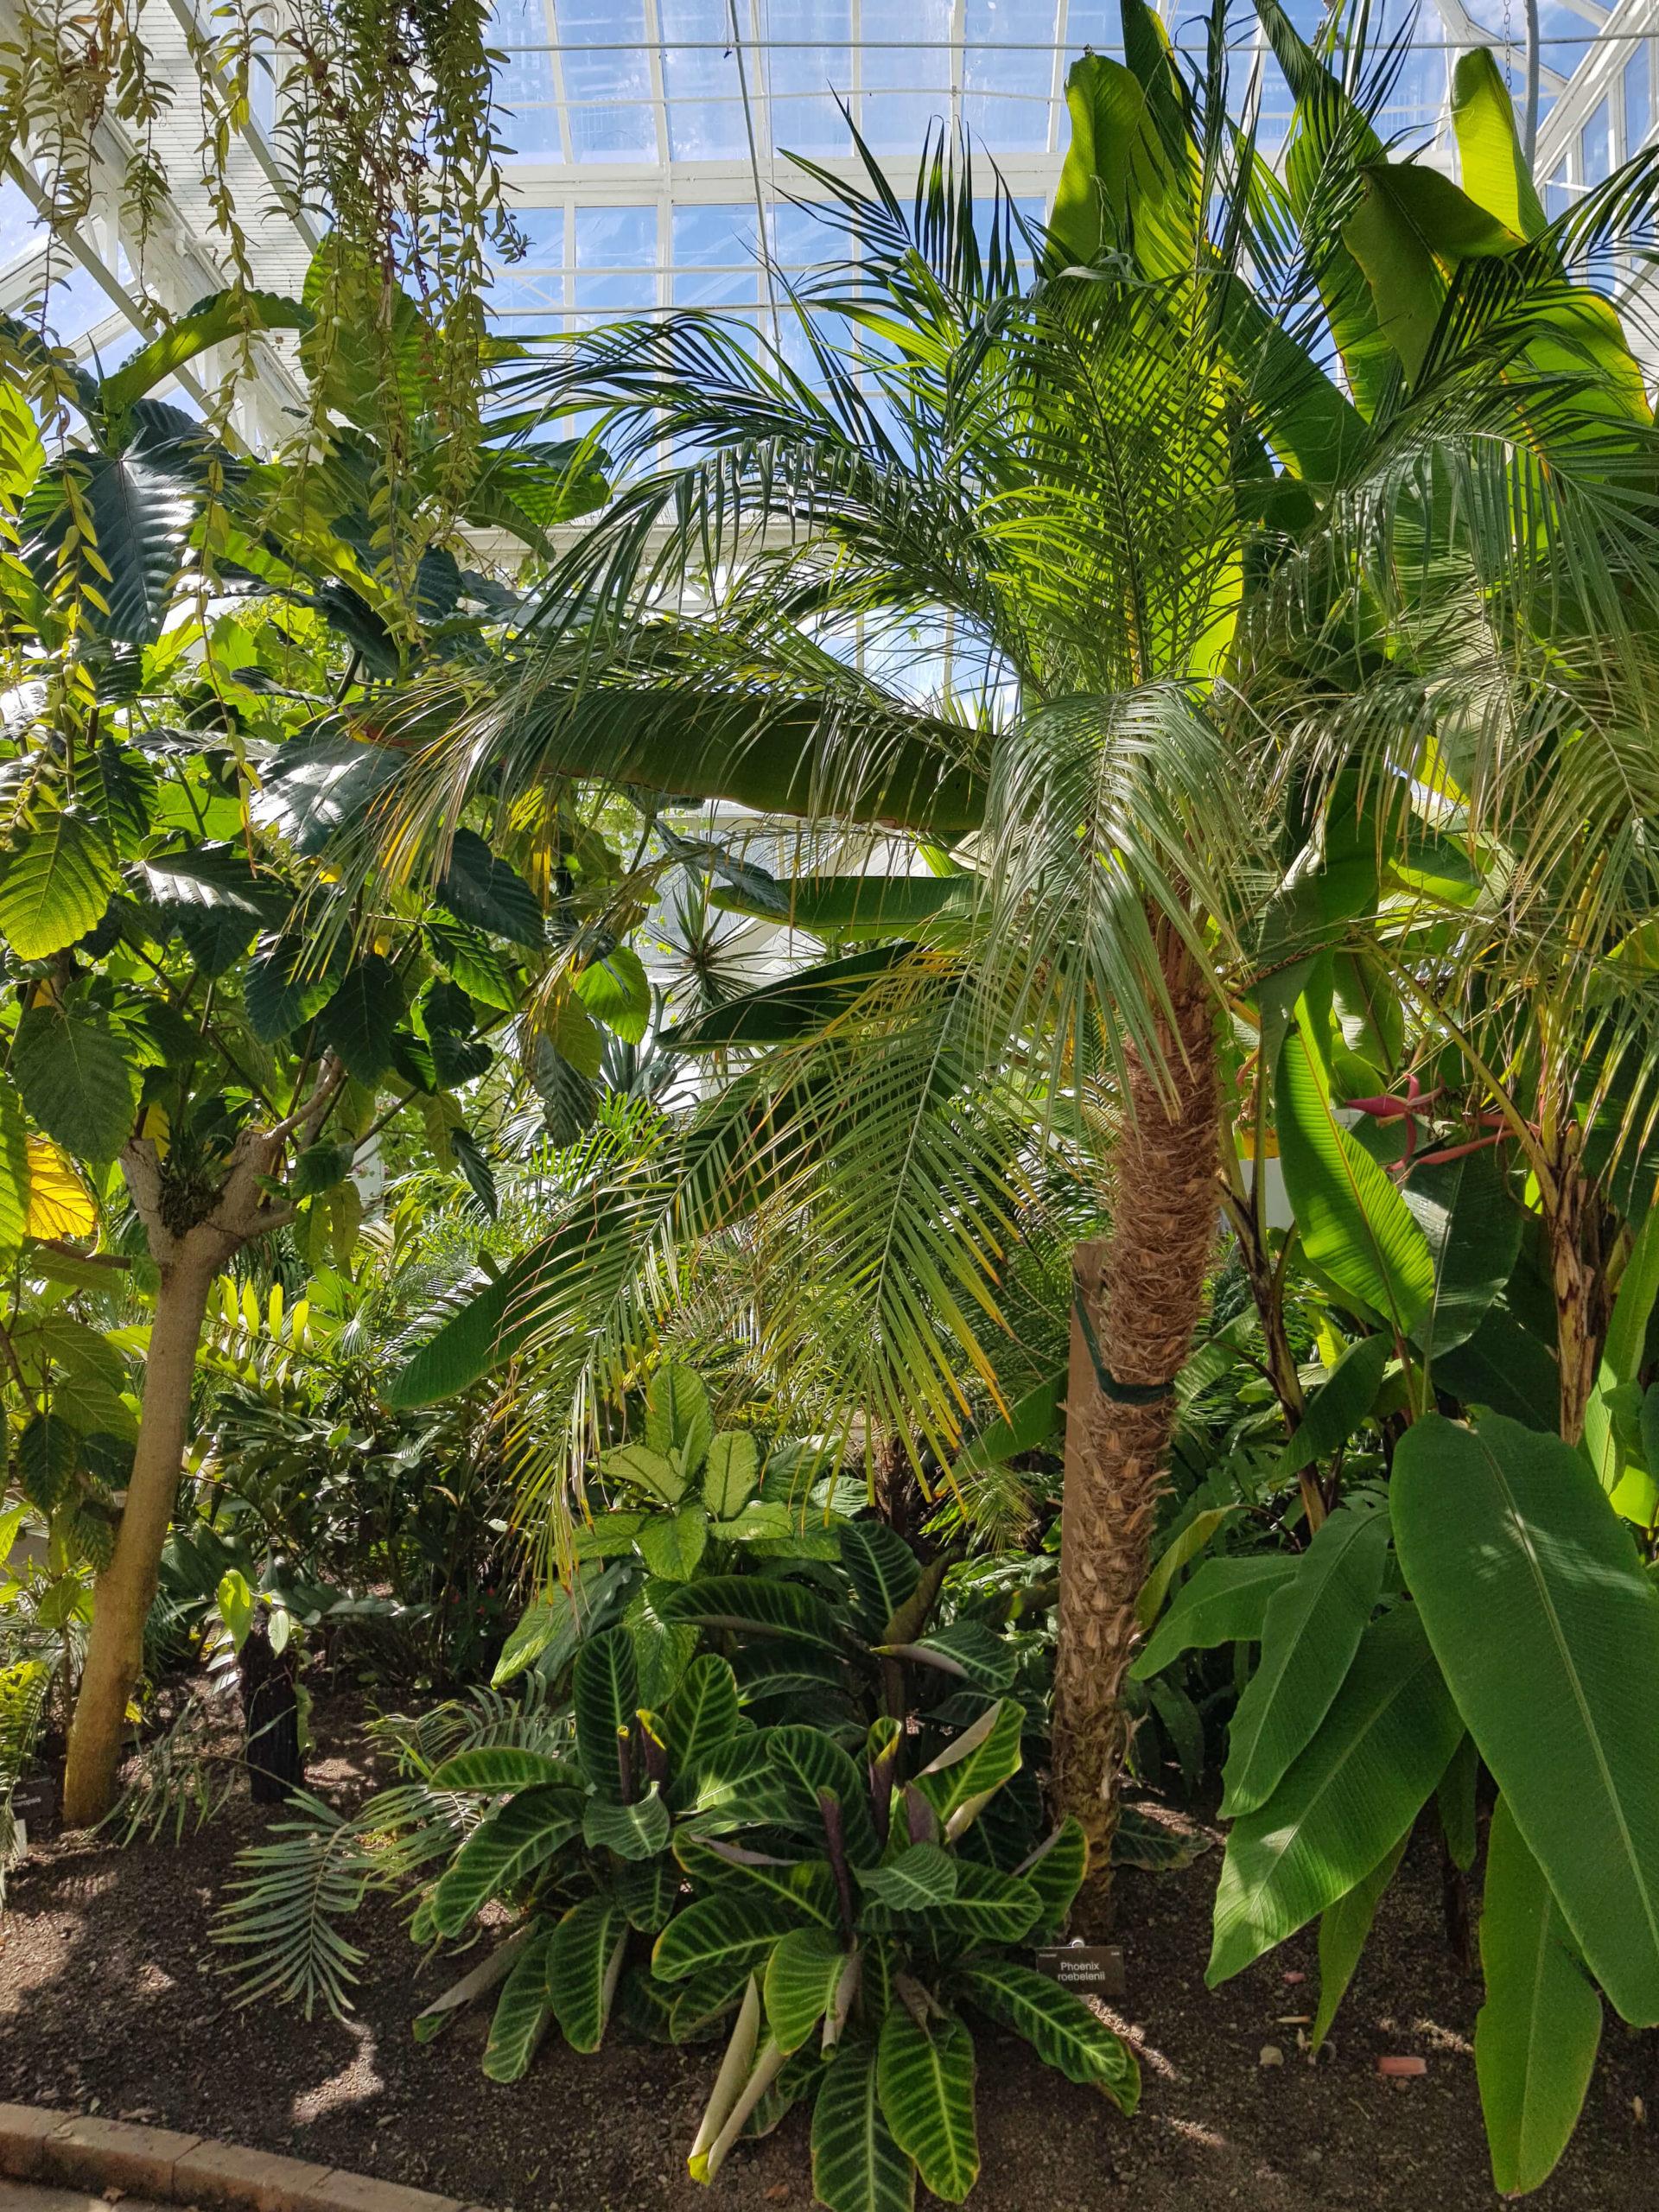 Serre tropicale jardin botanique Dunedin